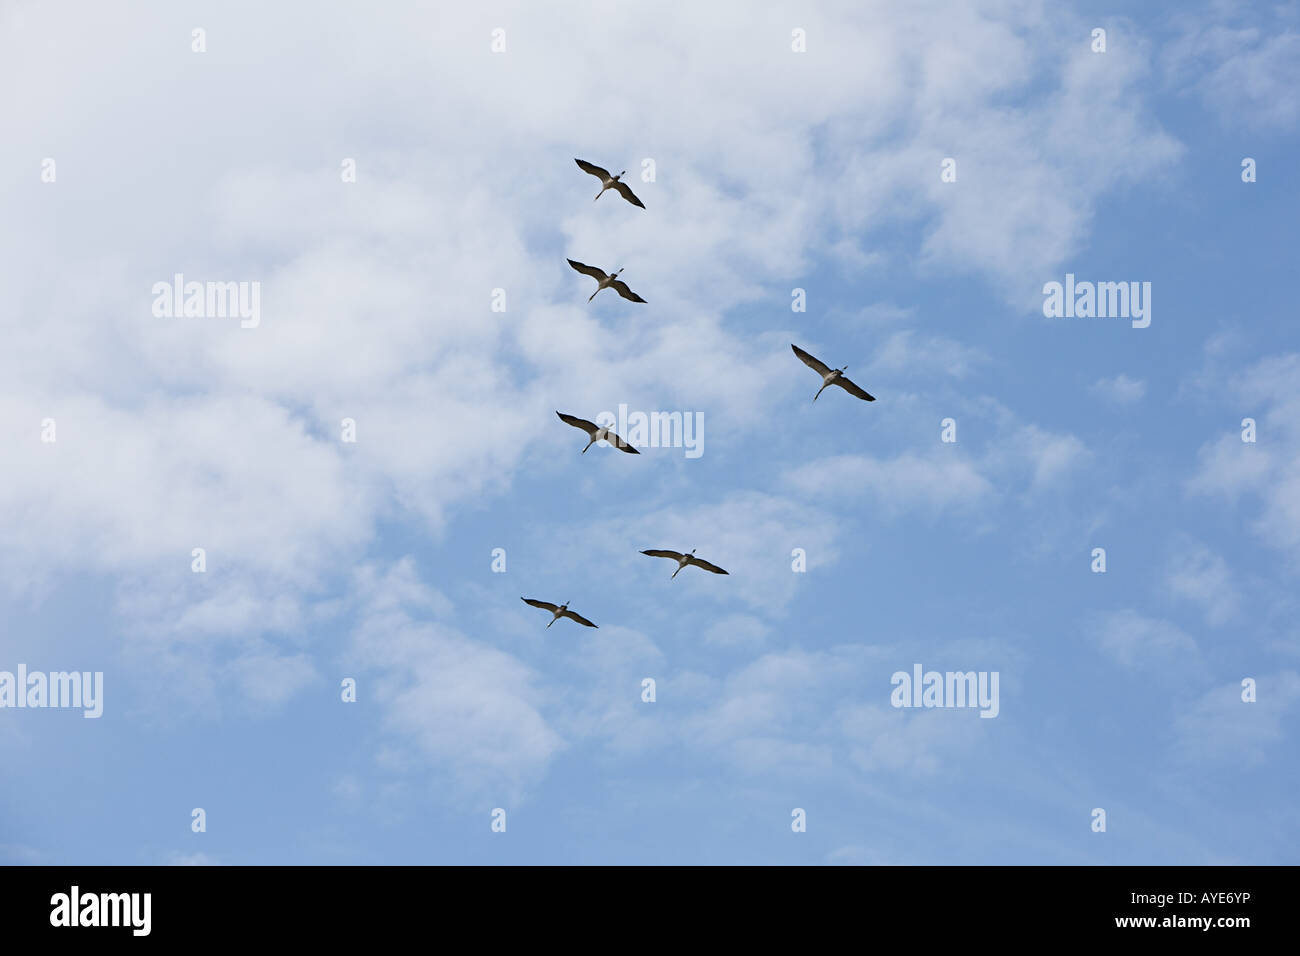 Six birds flying - Stock Image